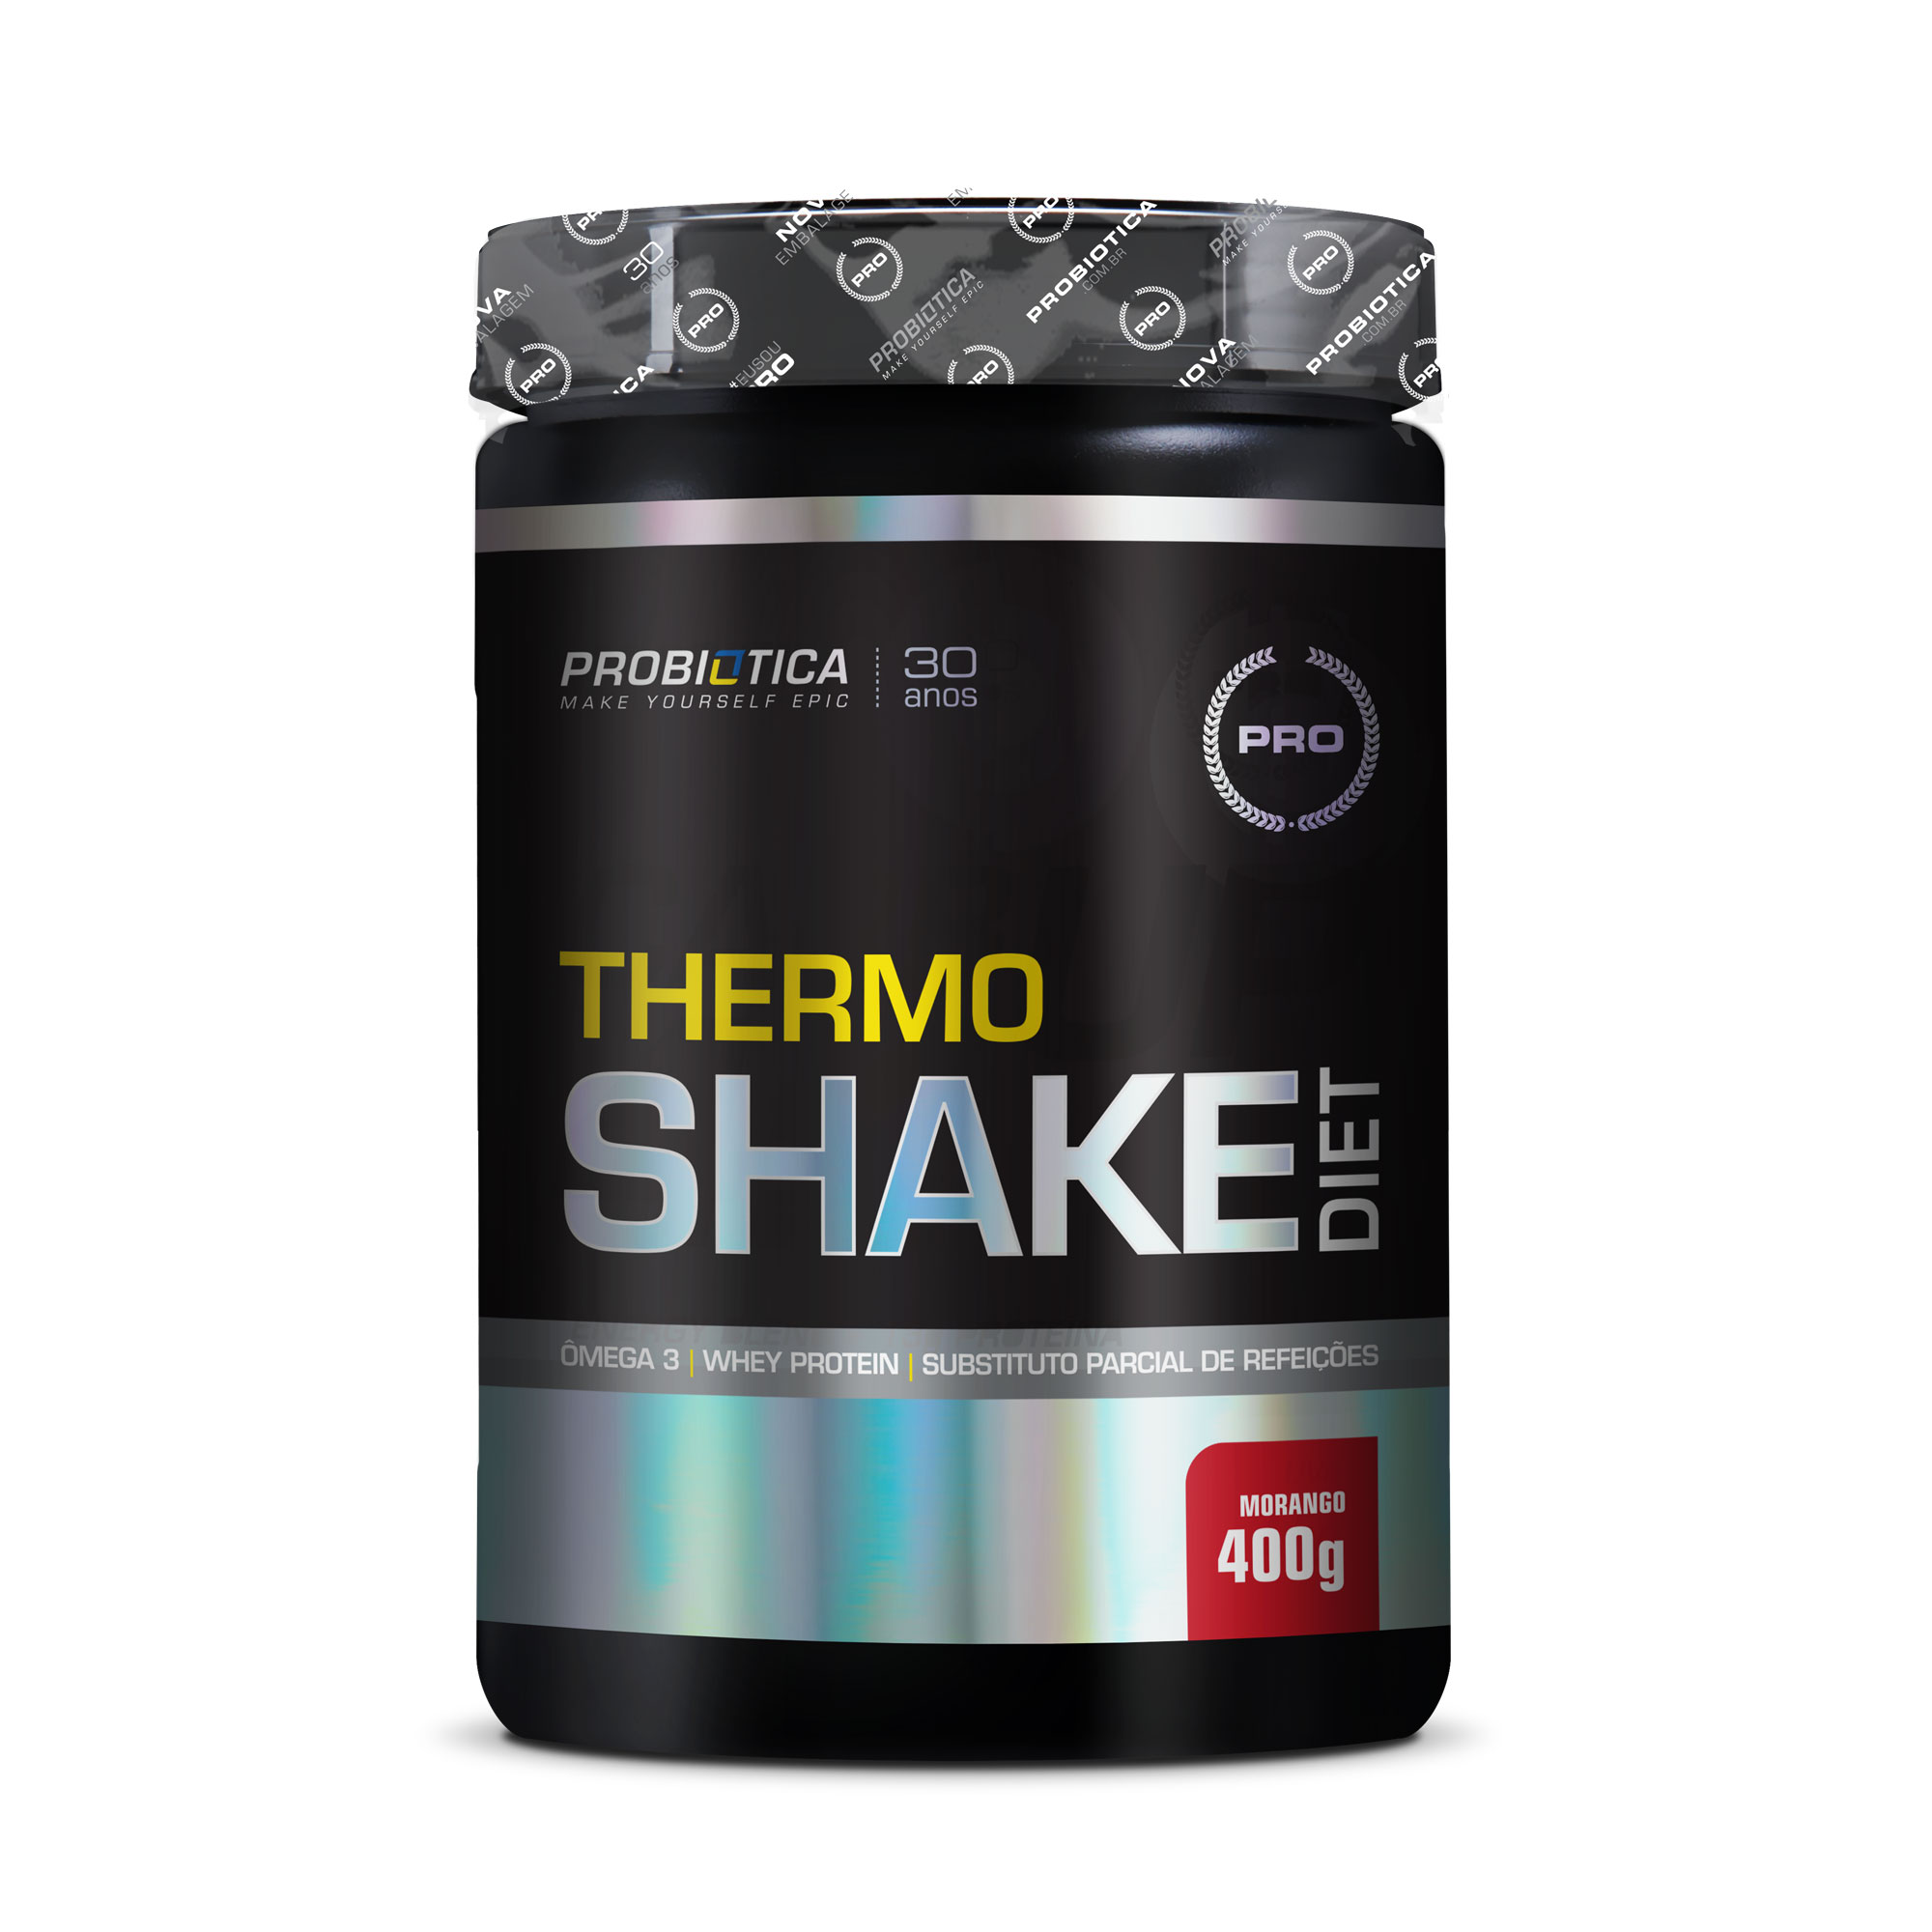 Thermoshake Diet Morango Probiotica  400g